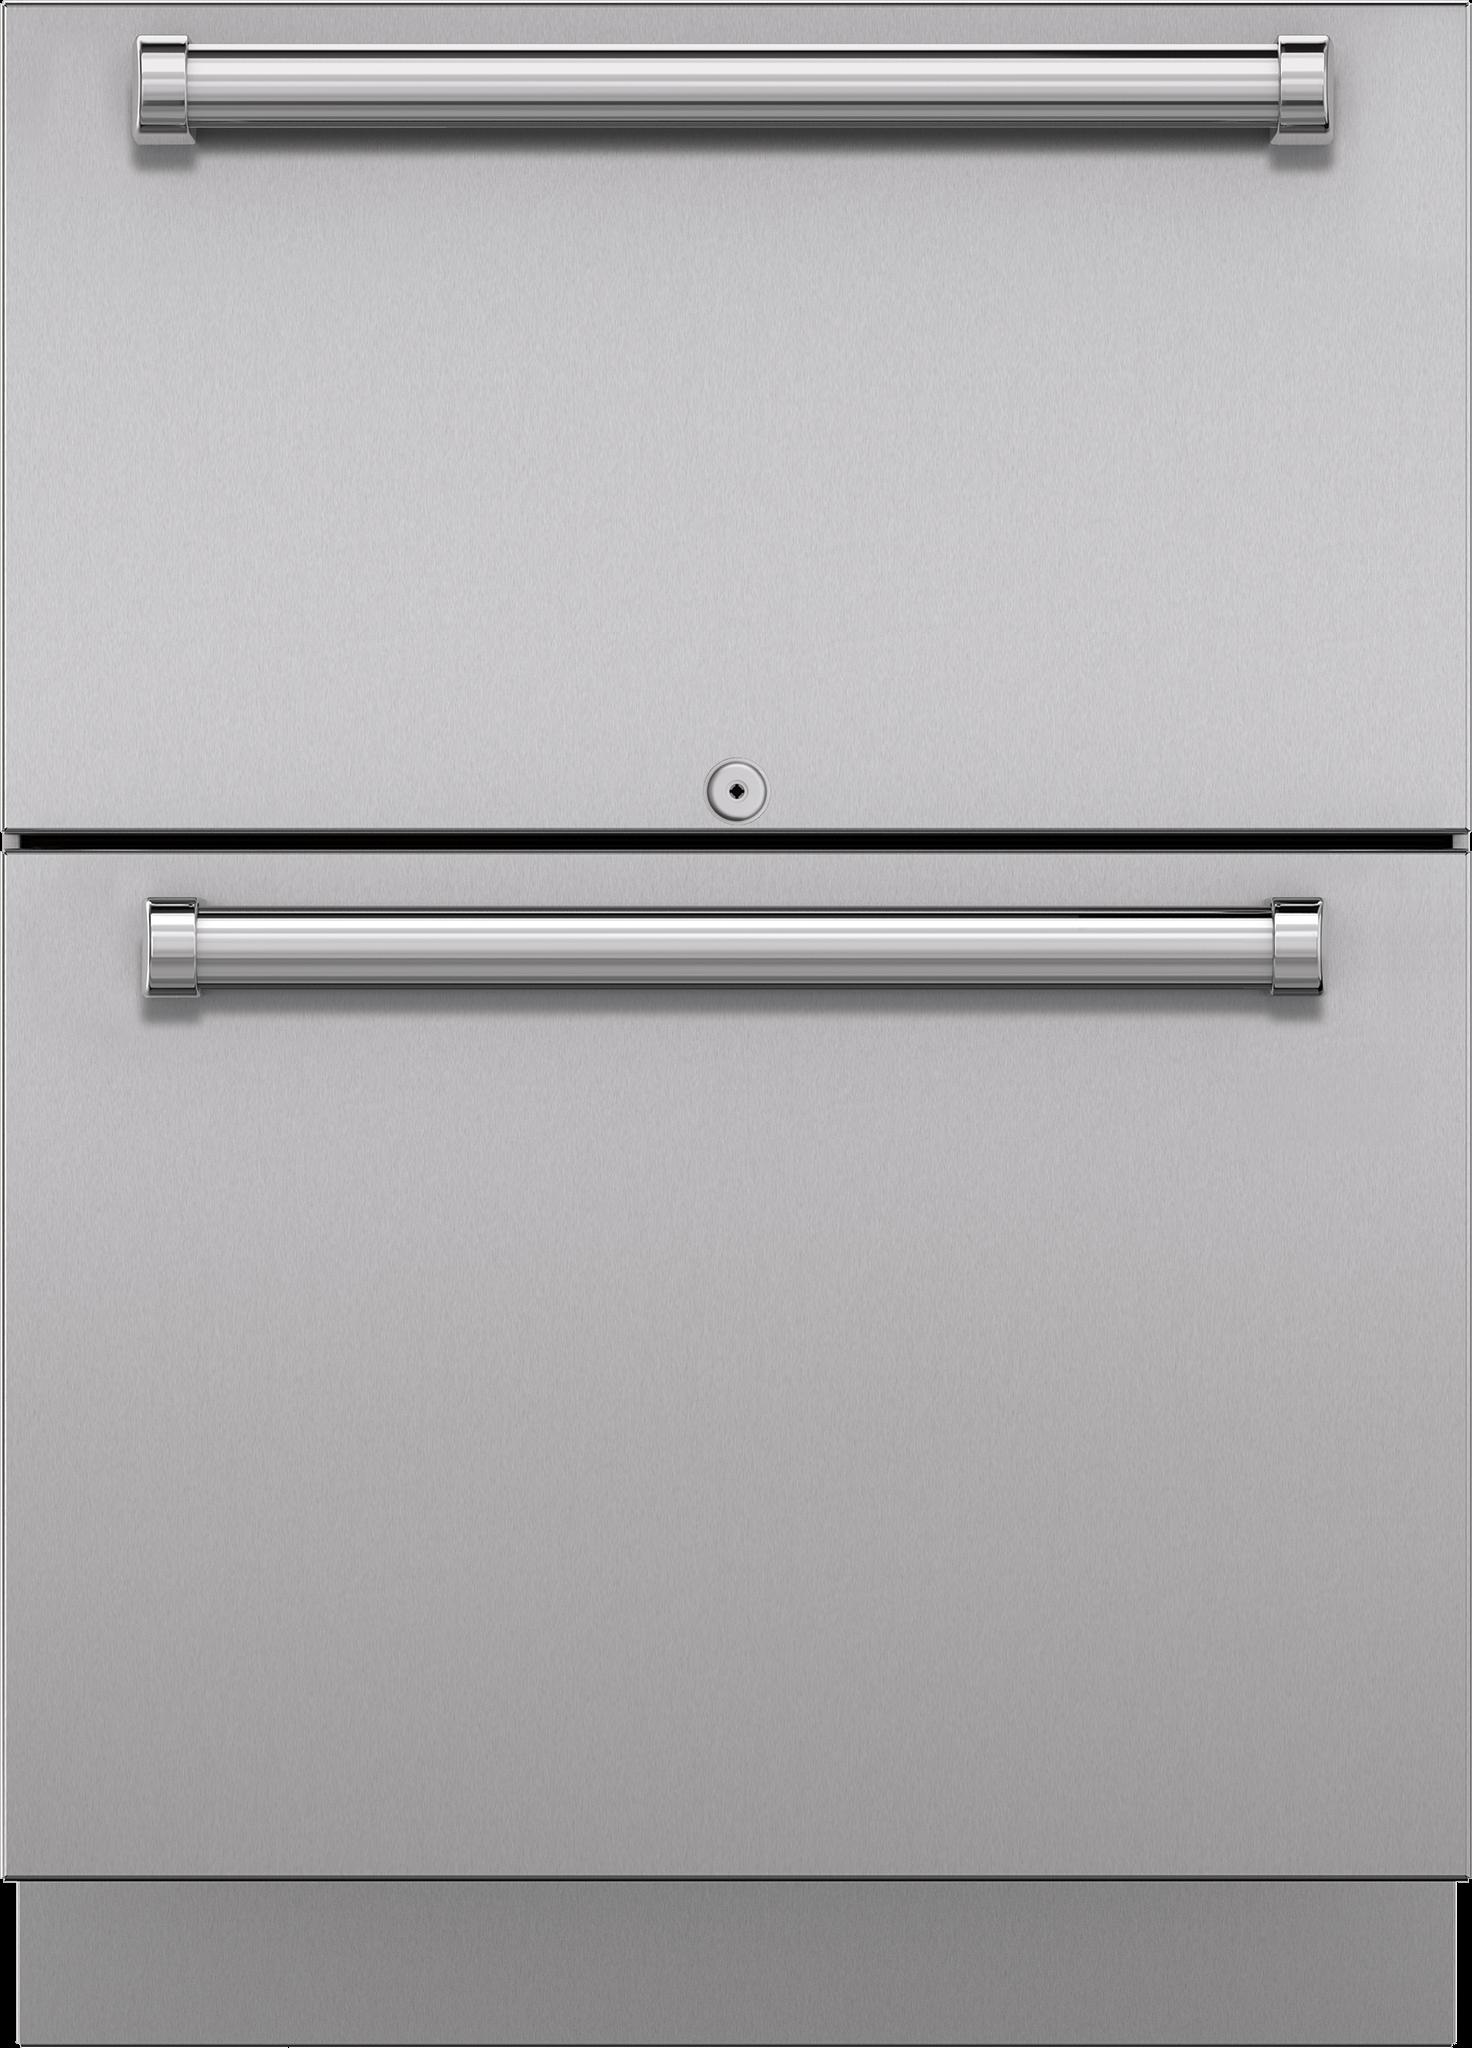 "Subzero24"" Designer Outdoor Refrigerator Drawers - Panel Ready"